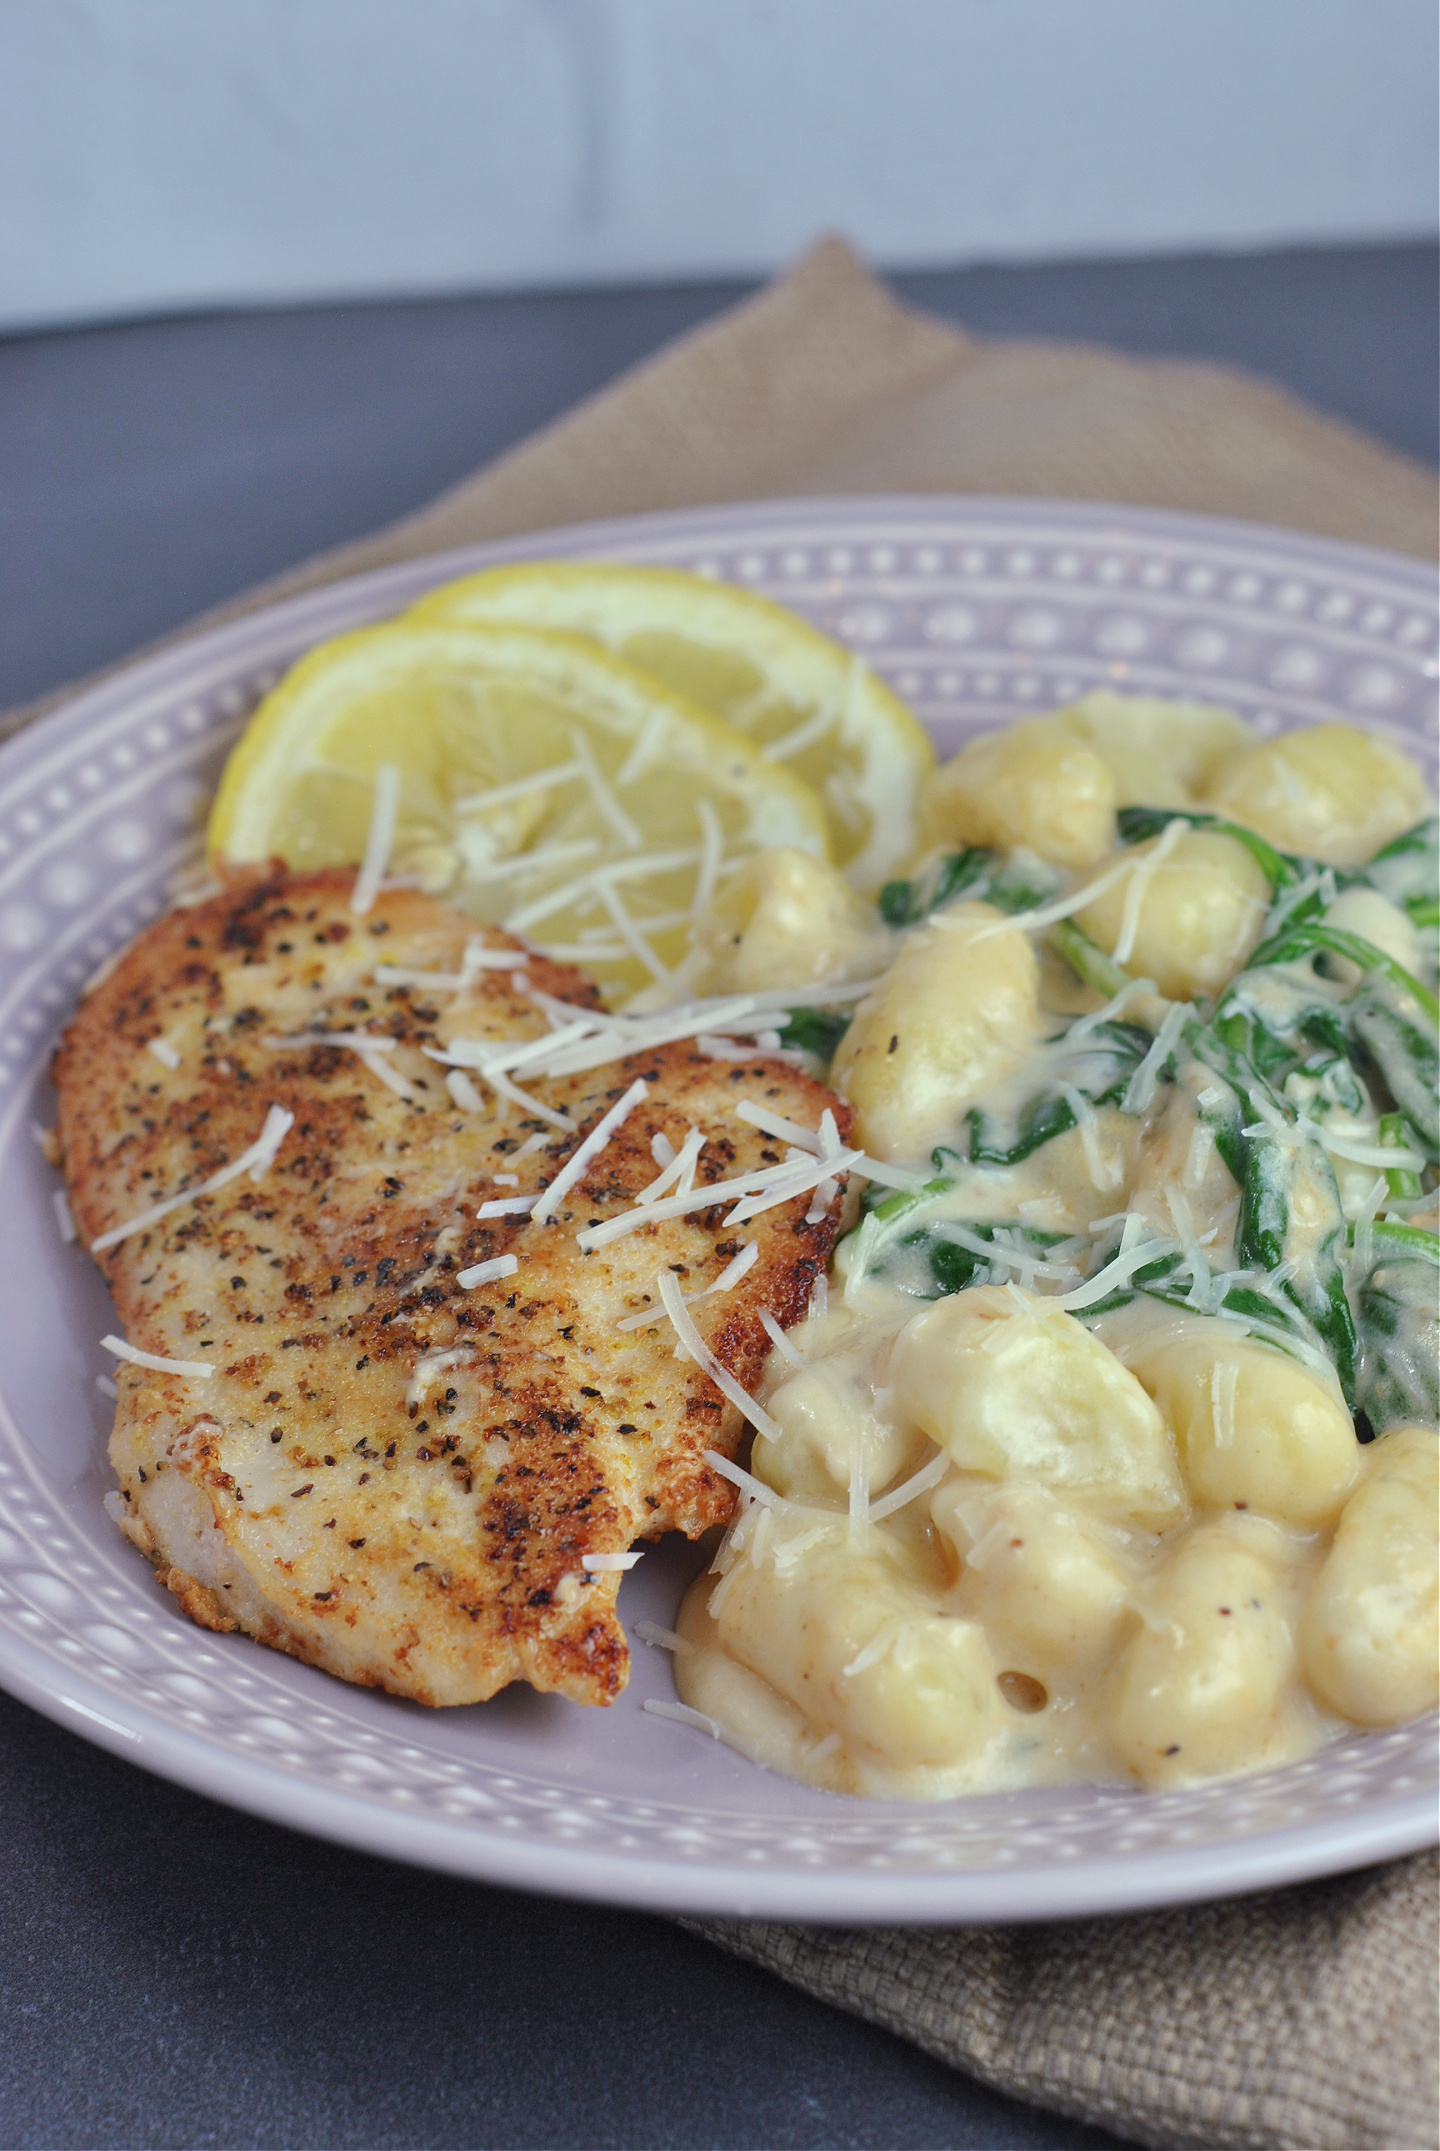 Creamy Lemon Chicken Gnocchi via @preventionrd